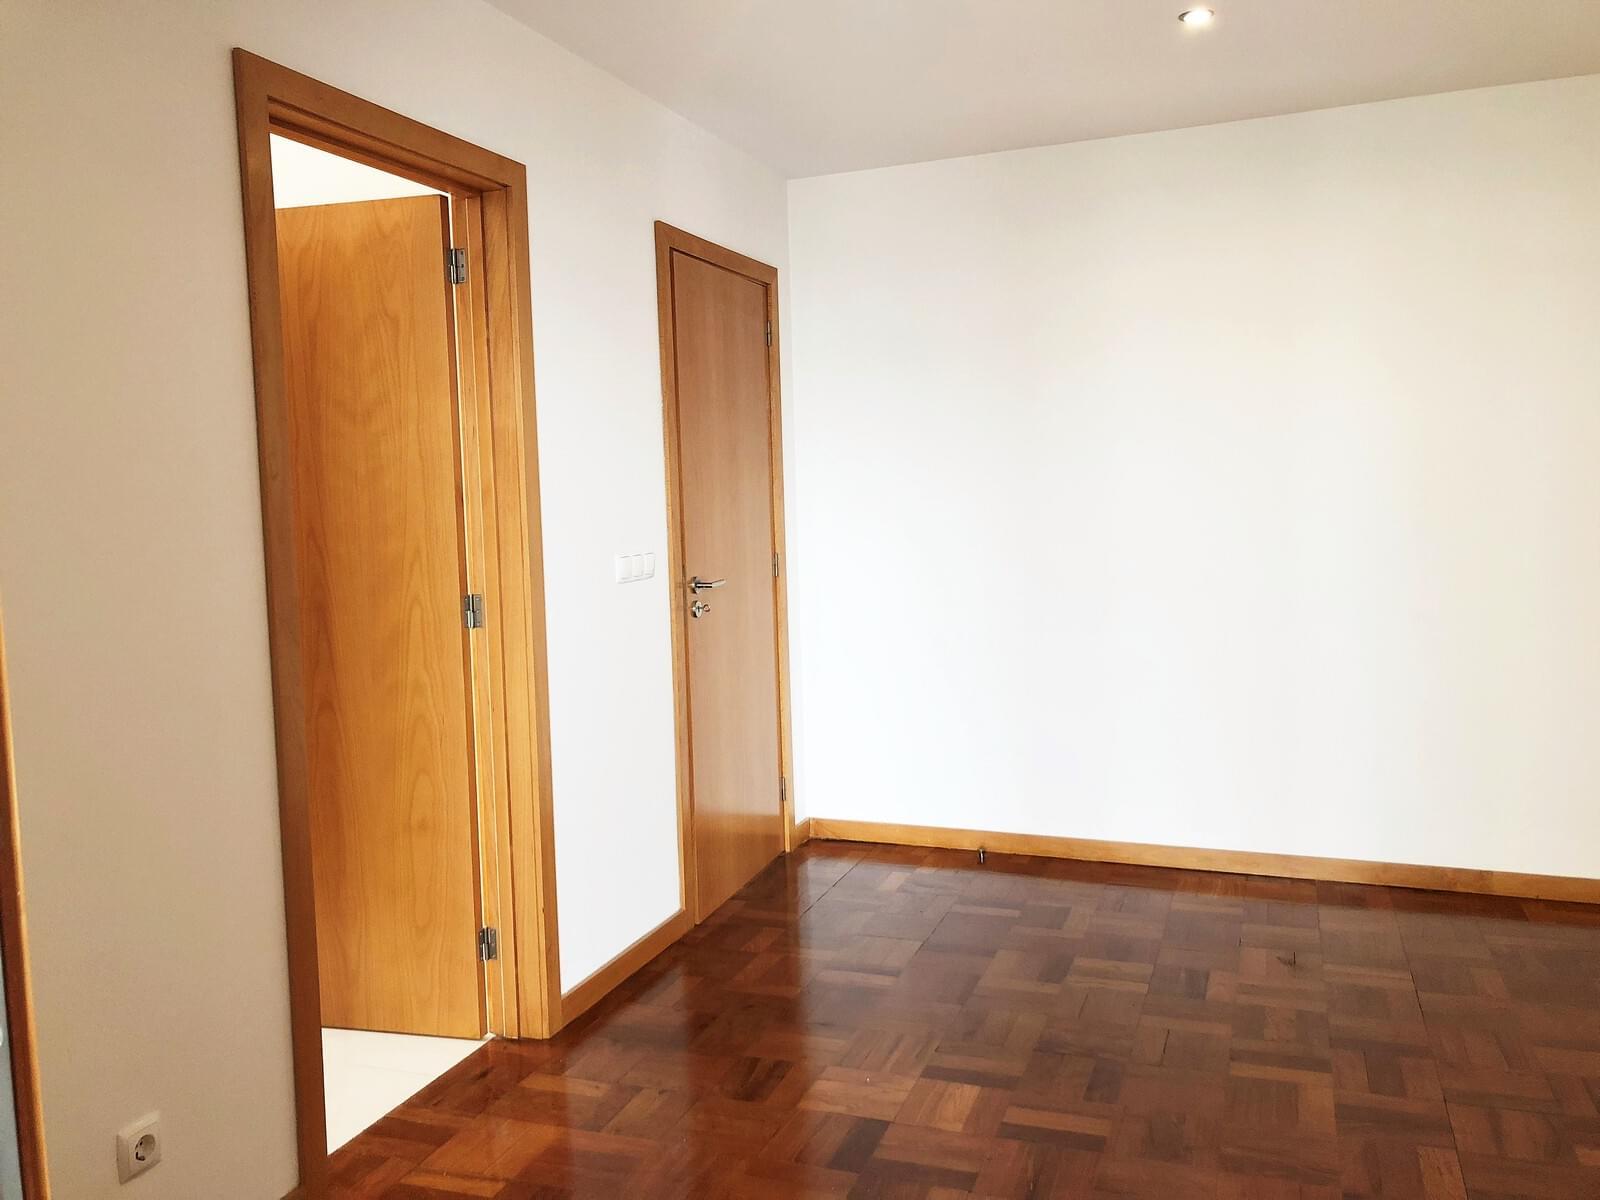 pf18040-apartamento-t3-lisboa-6c3a4ede-5a7f-4cd3-8faf-29d3913f5f44